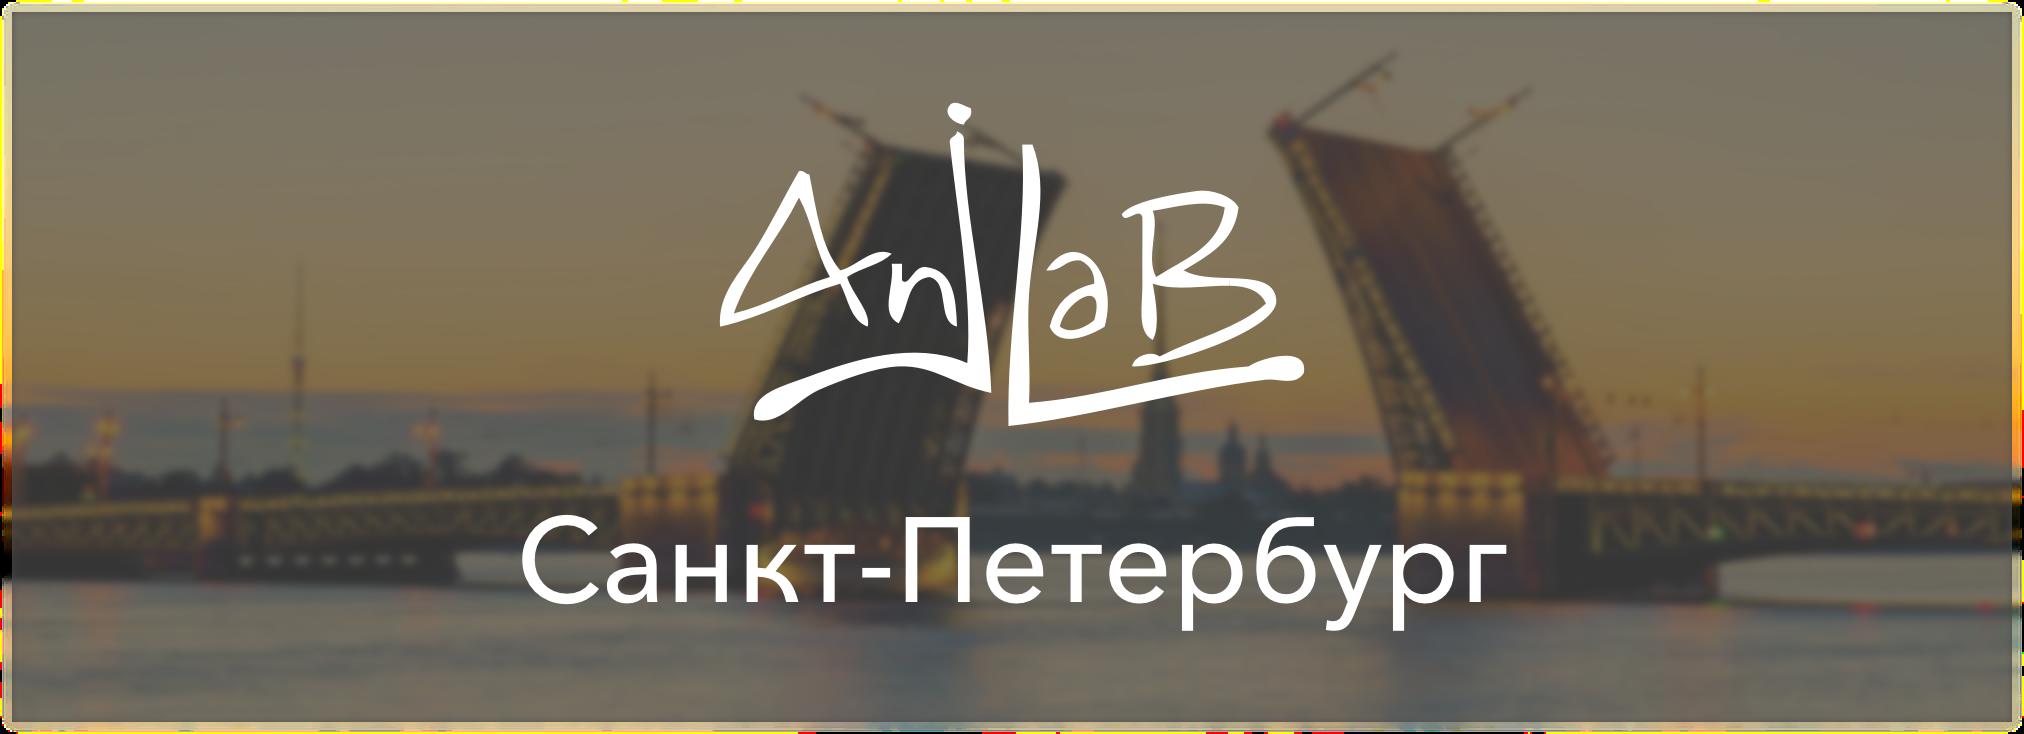 AnjLab-spb-titleimage@2x